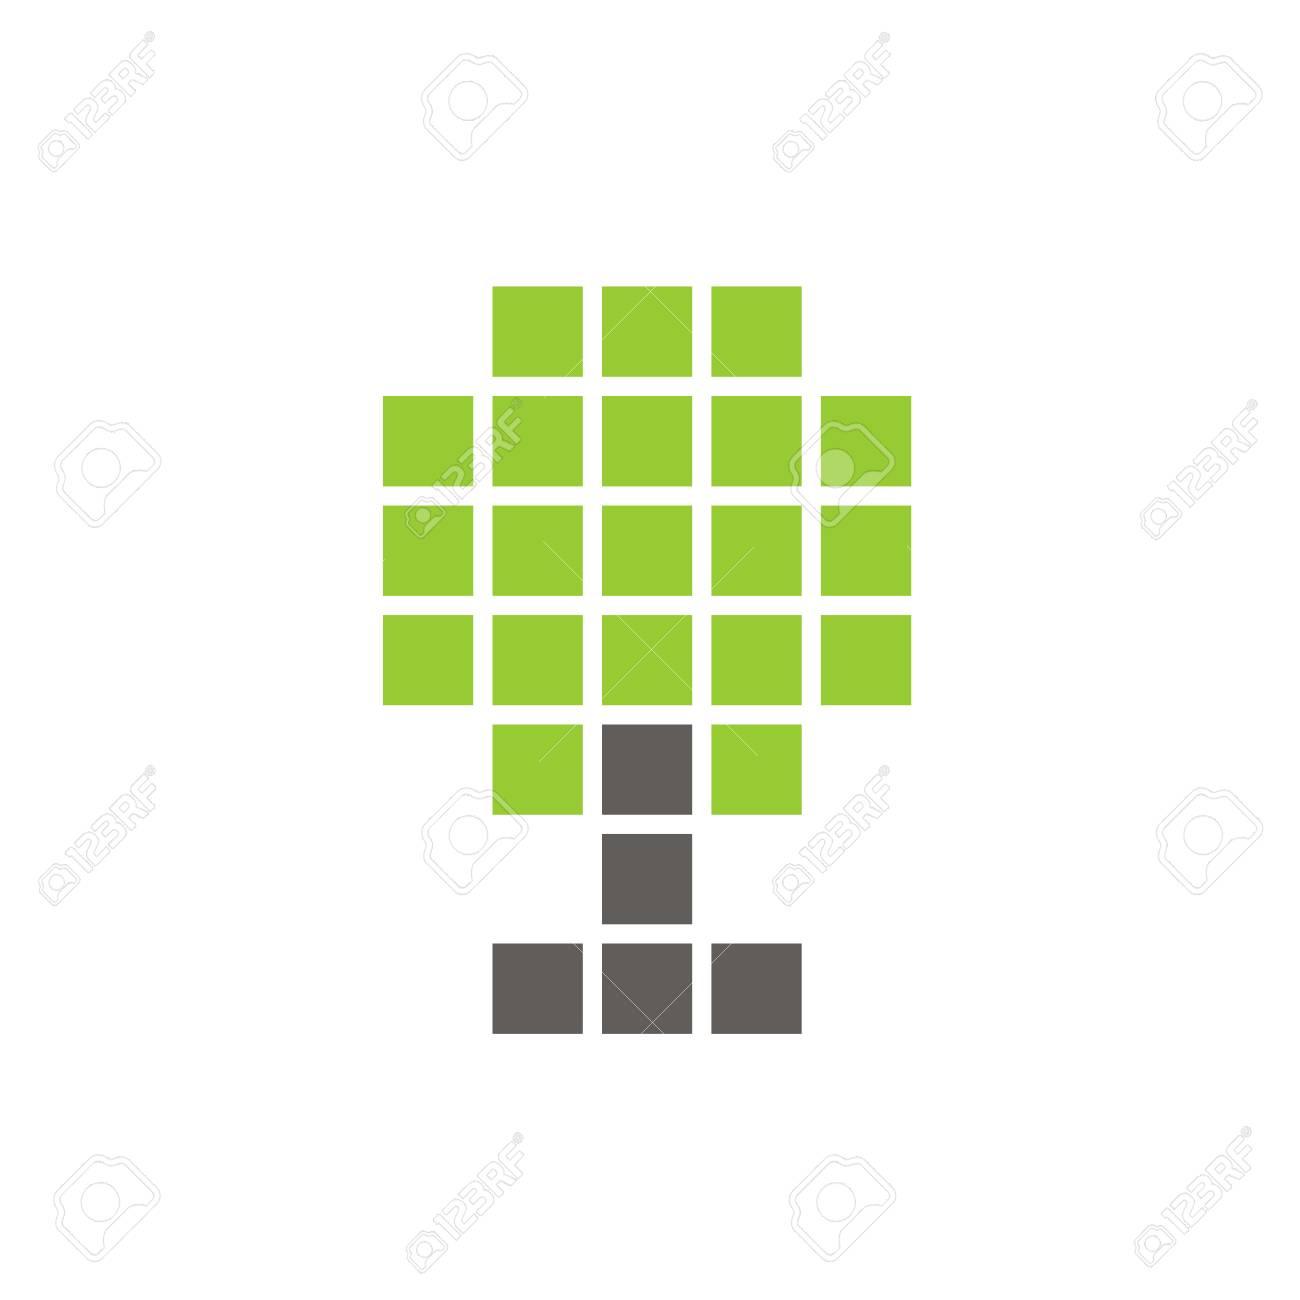 Pixel Tree Symbol Digital Plant Icon Design Vector Logo Illustration Royalty Free Cliparts Vectors And Stock Illustration Image 105656121